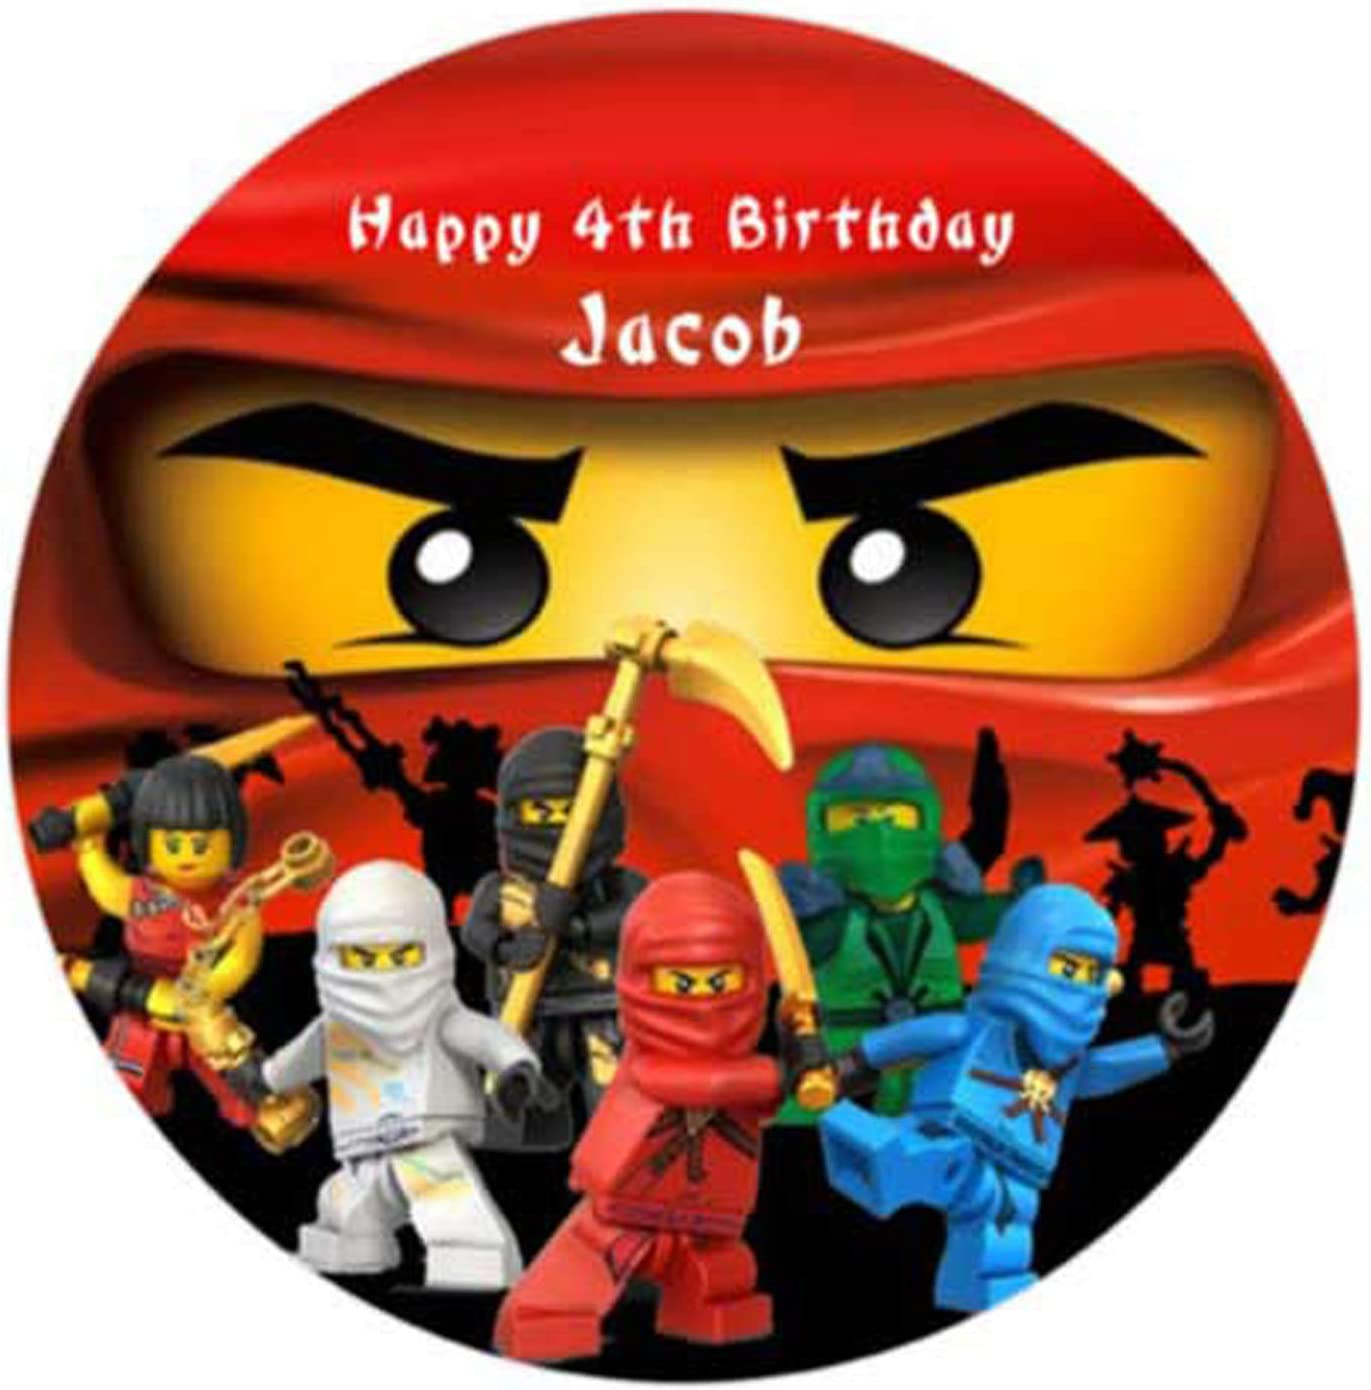 Pleasing Ninjago Personalized Cake Topper Icing Sugar Paper 7 5 Ninja Red Funny Birthday Cards Online Alyptdamsfinfo